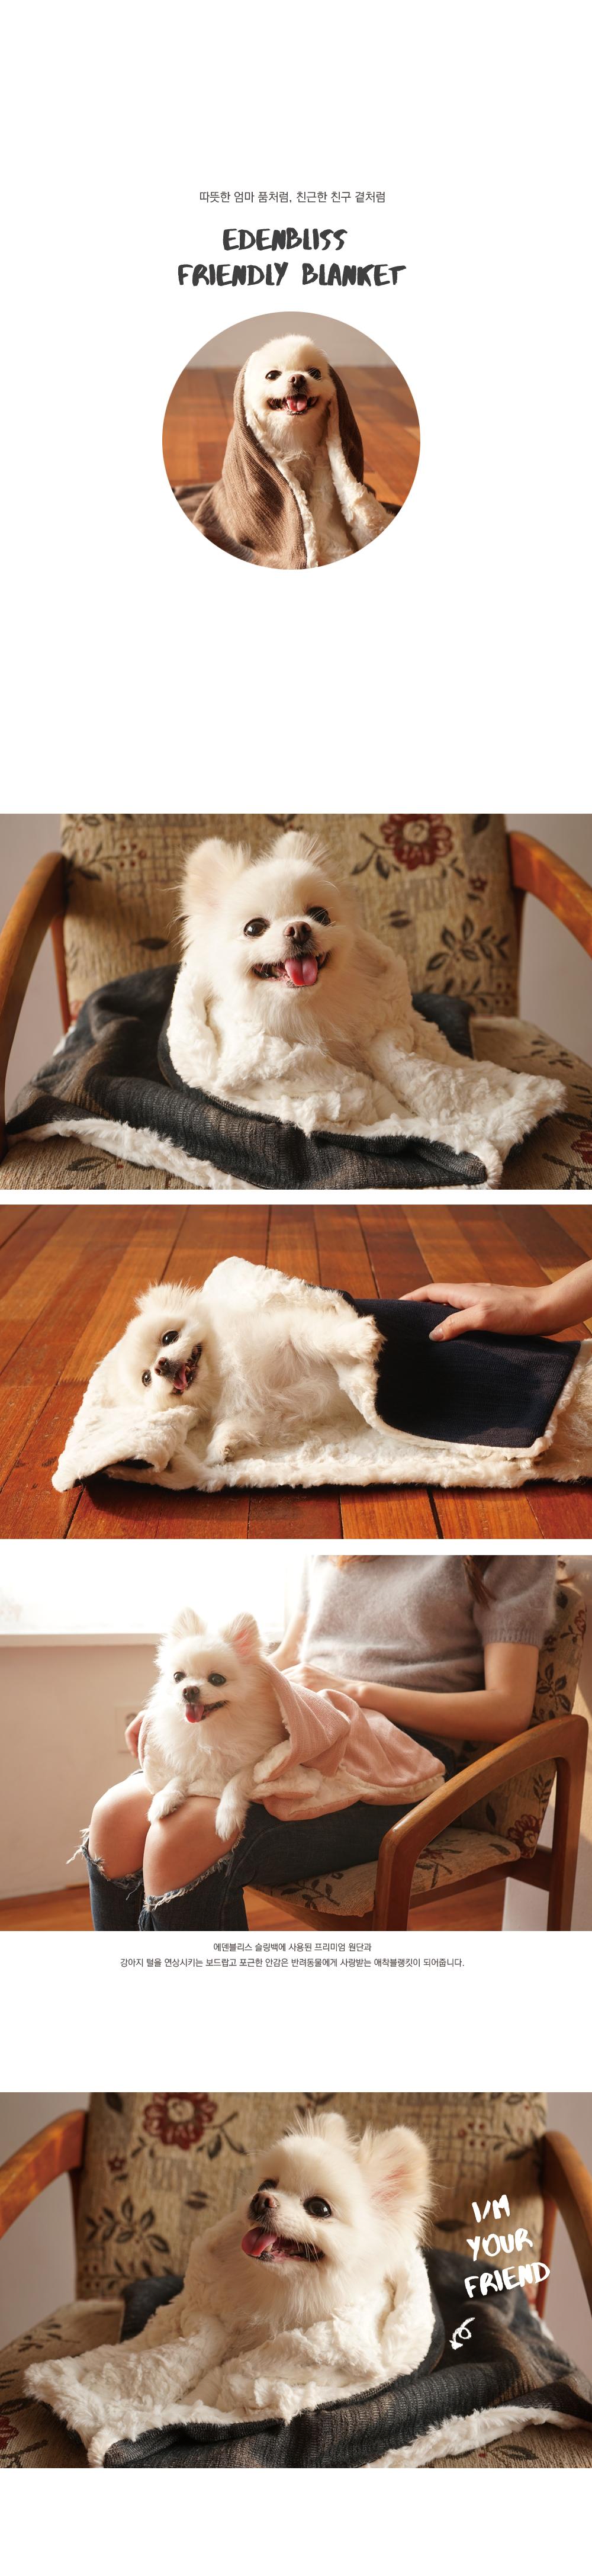 edenbliss 프렌들리 블랭킷 멜란지그레이-강아지 고양이 담요 이불 - 에덴블리스, 37,000원, 하우스/식기/실내용품, 방석/매트